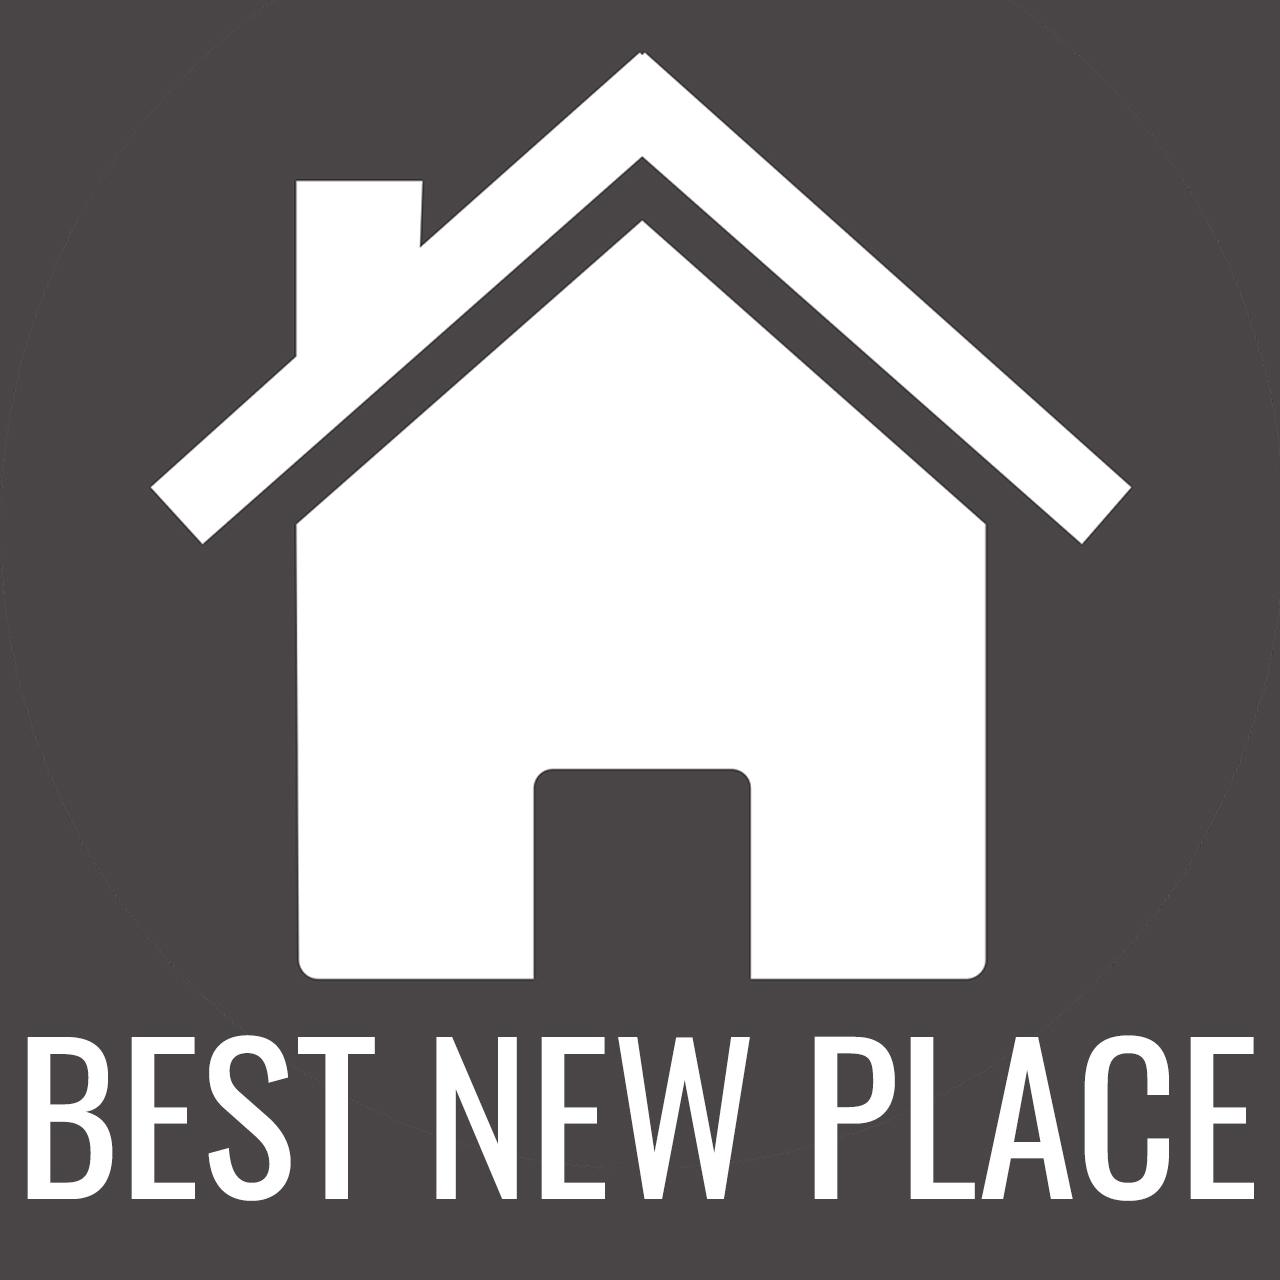 Best New Place